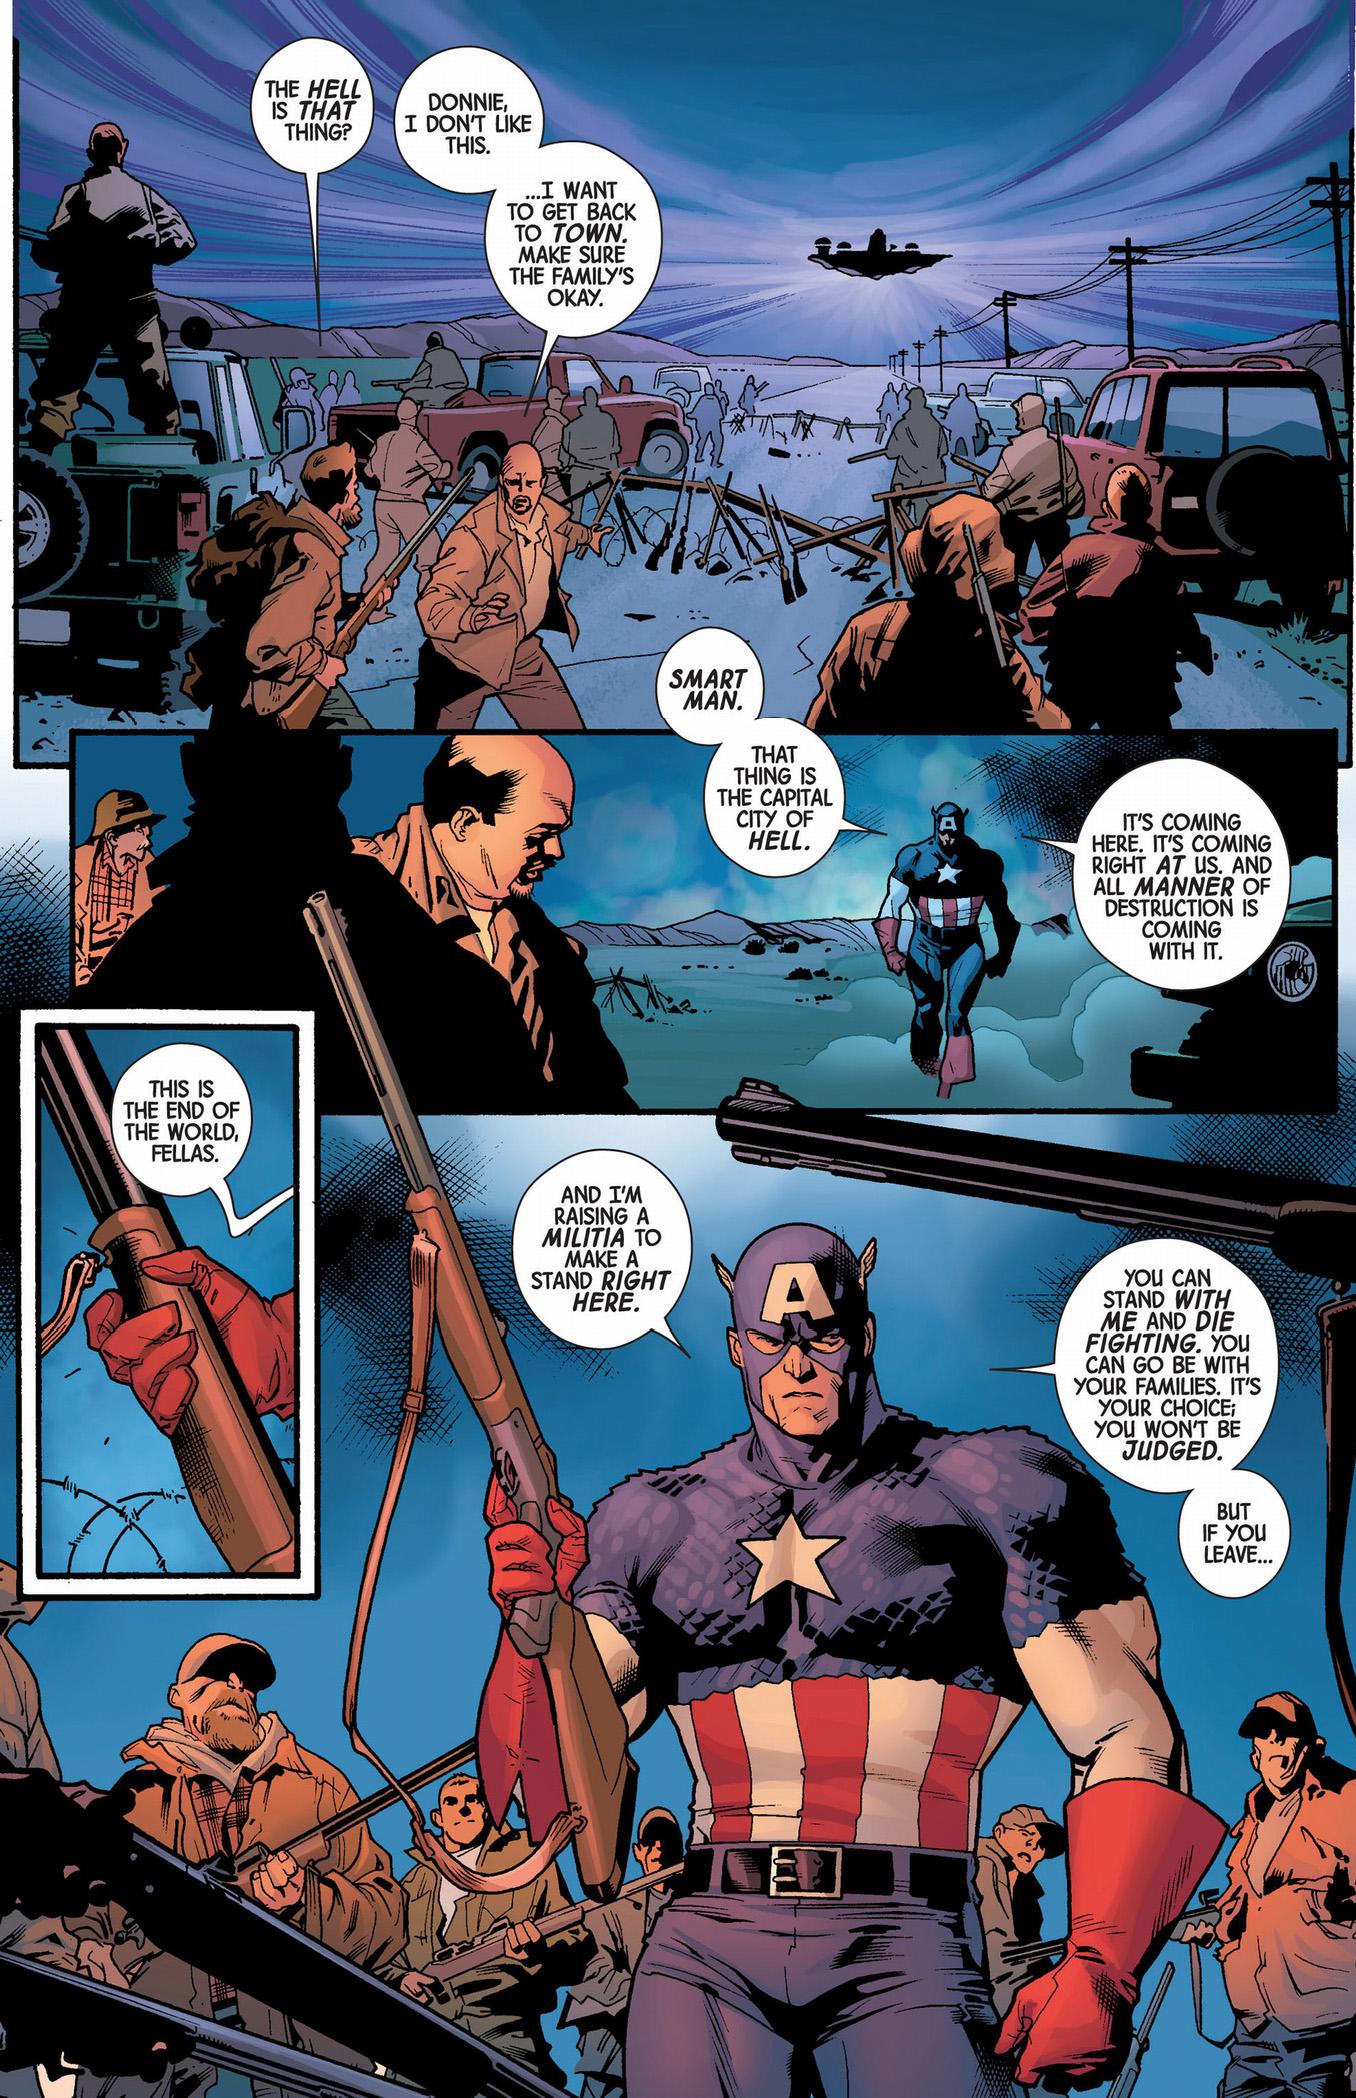 America S Best Lifechangers: Captain America's Militia Against The Serpent